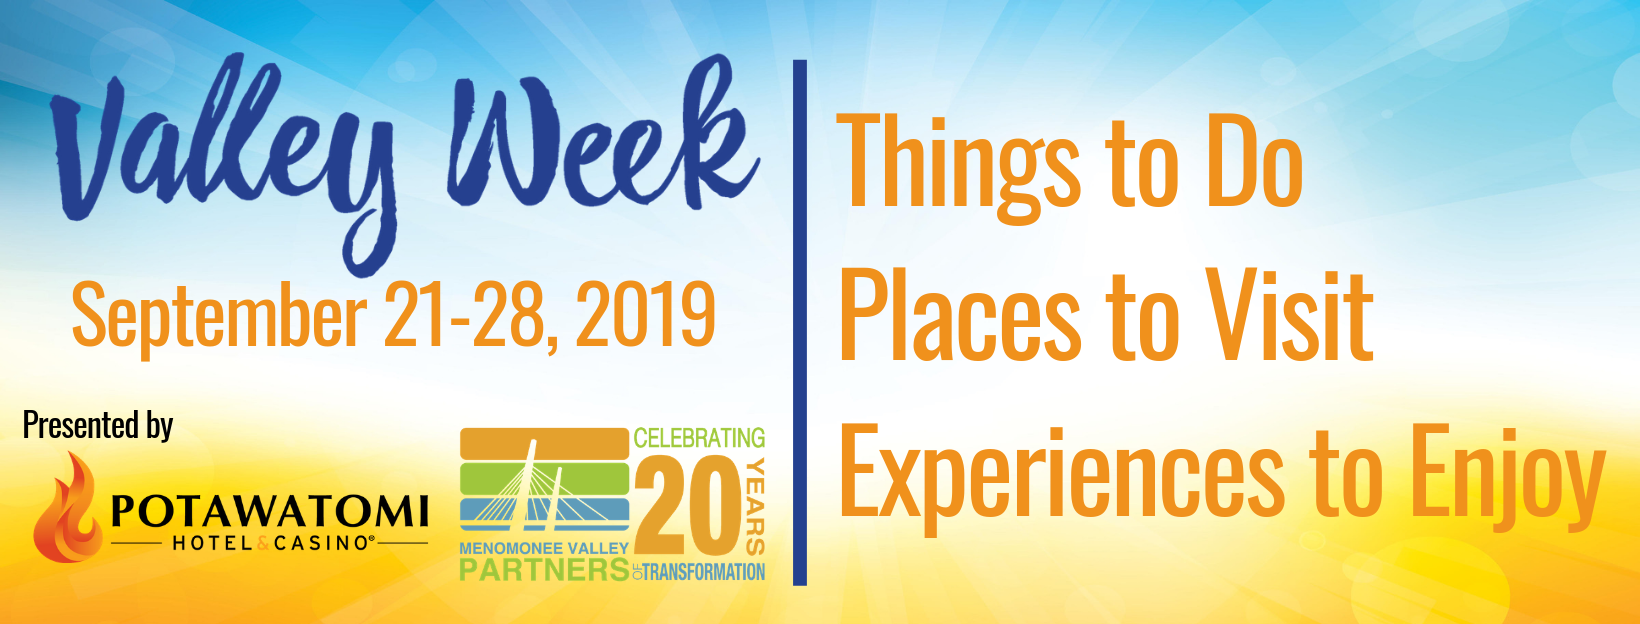 Valley Week 2019 banner - hi res.png